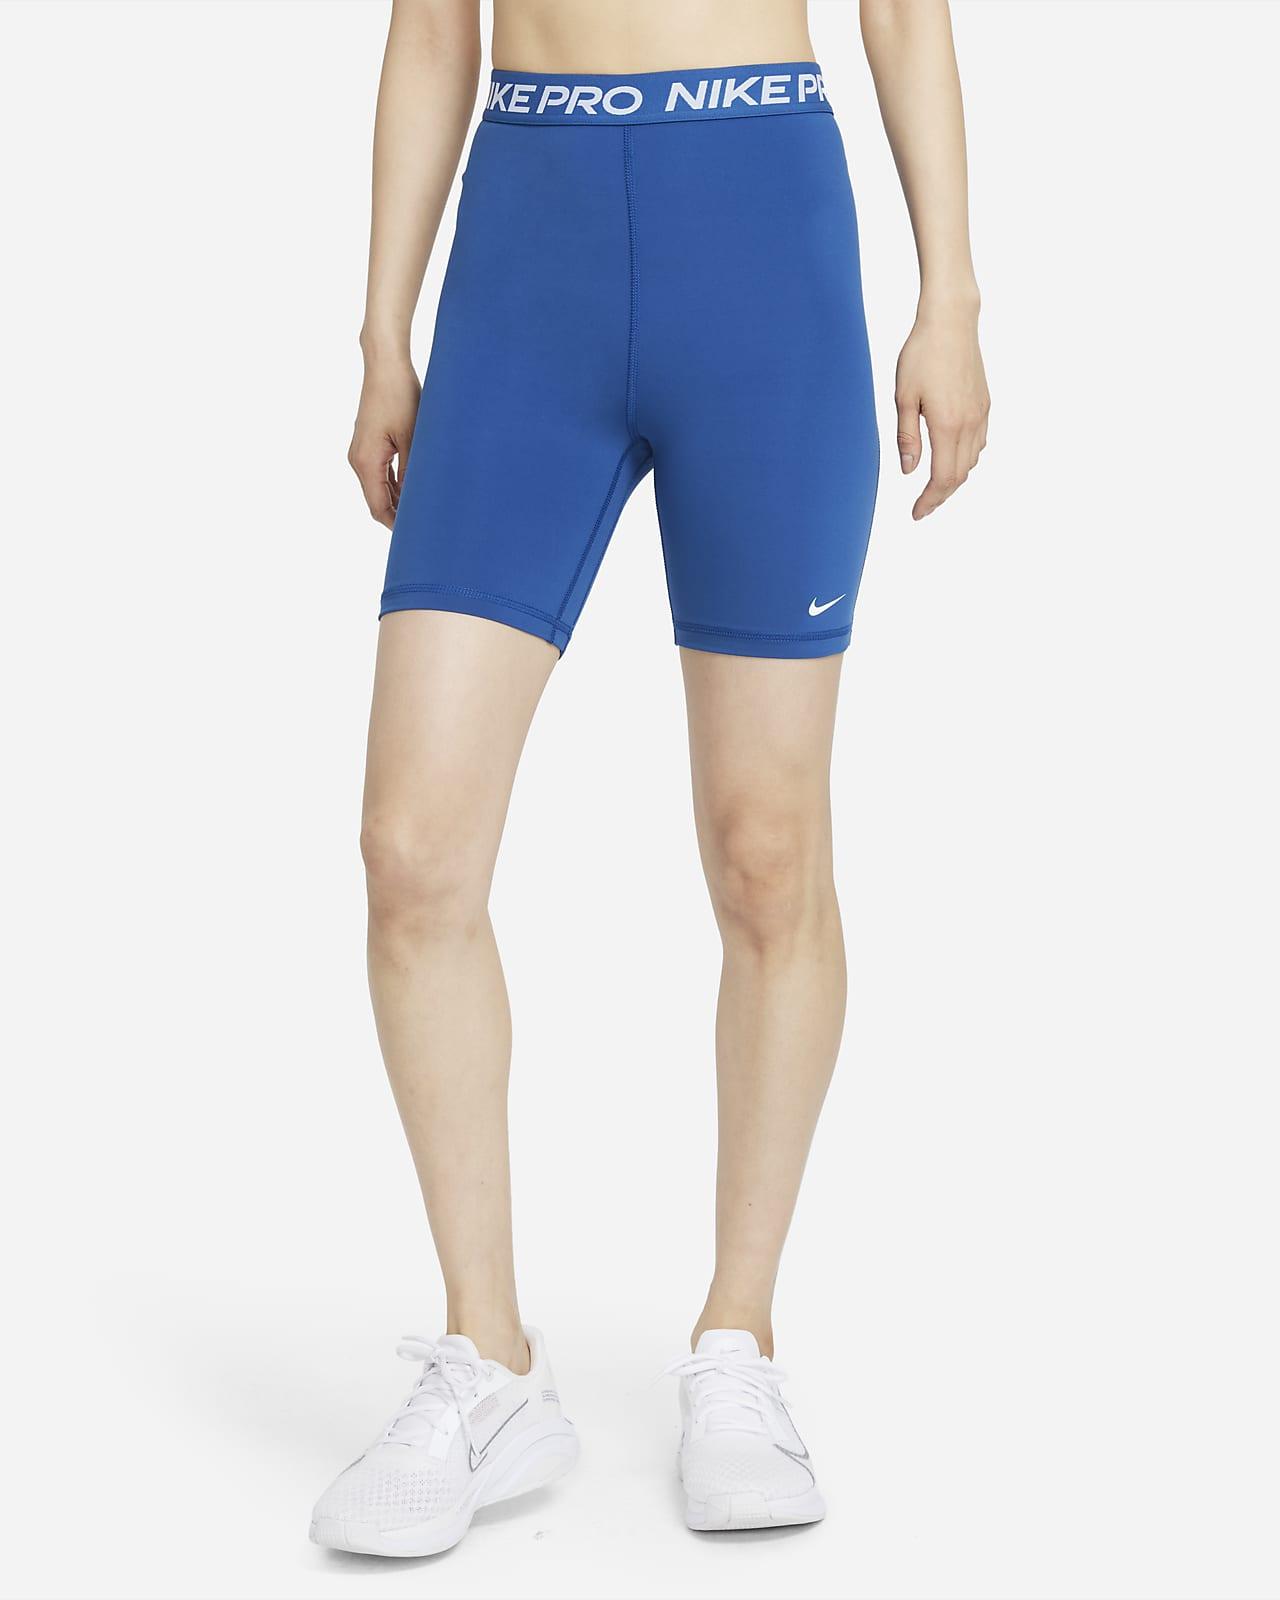 Shorts de 18 cm y tiro alto para mujer Nike Pro 365